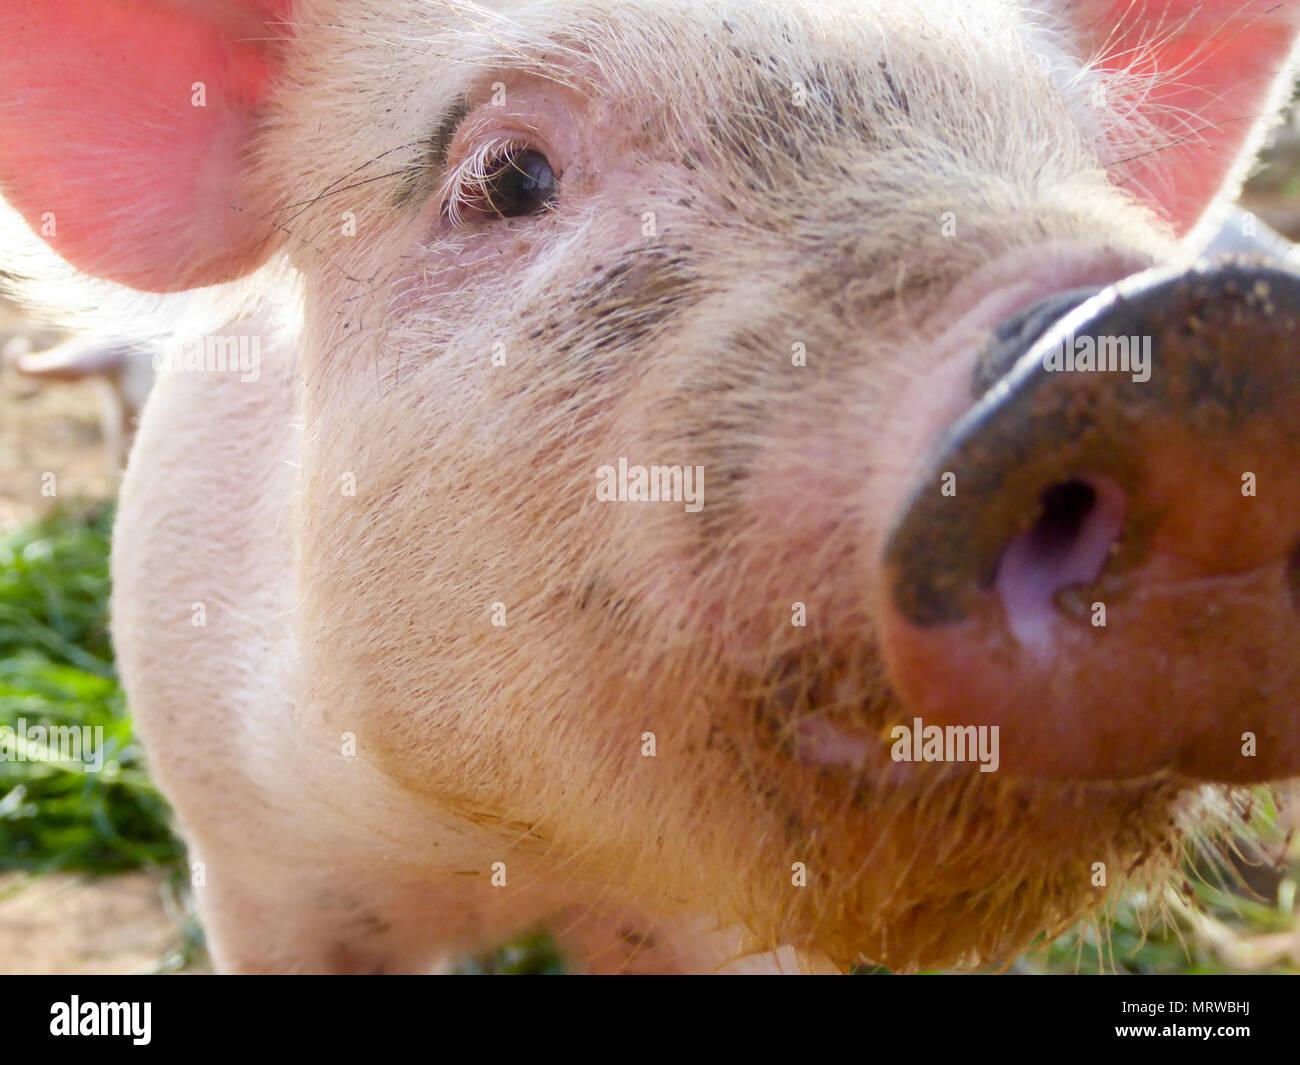 Domestic Pig (Sus scrofa domestica) Piglet, curious, portrait, close-up, Majorca, Balearic Islands, Spain - Stock Image